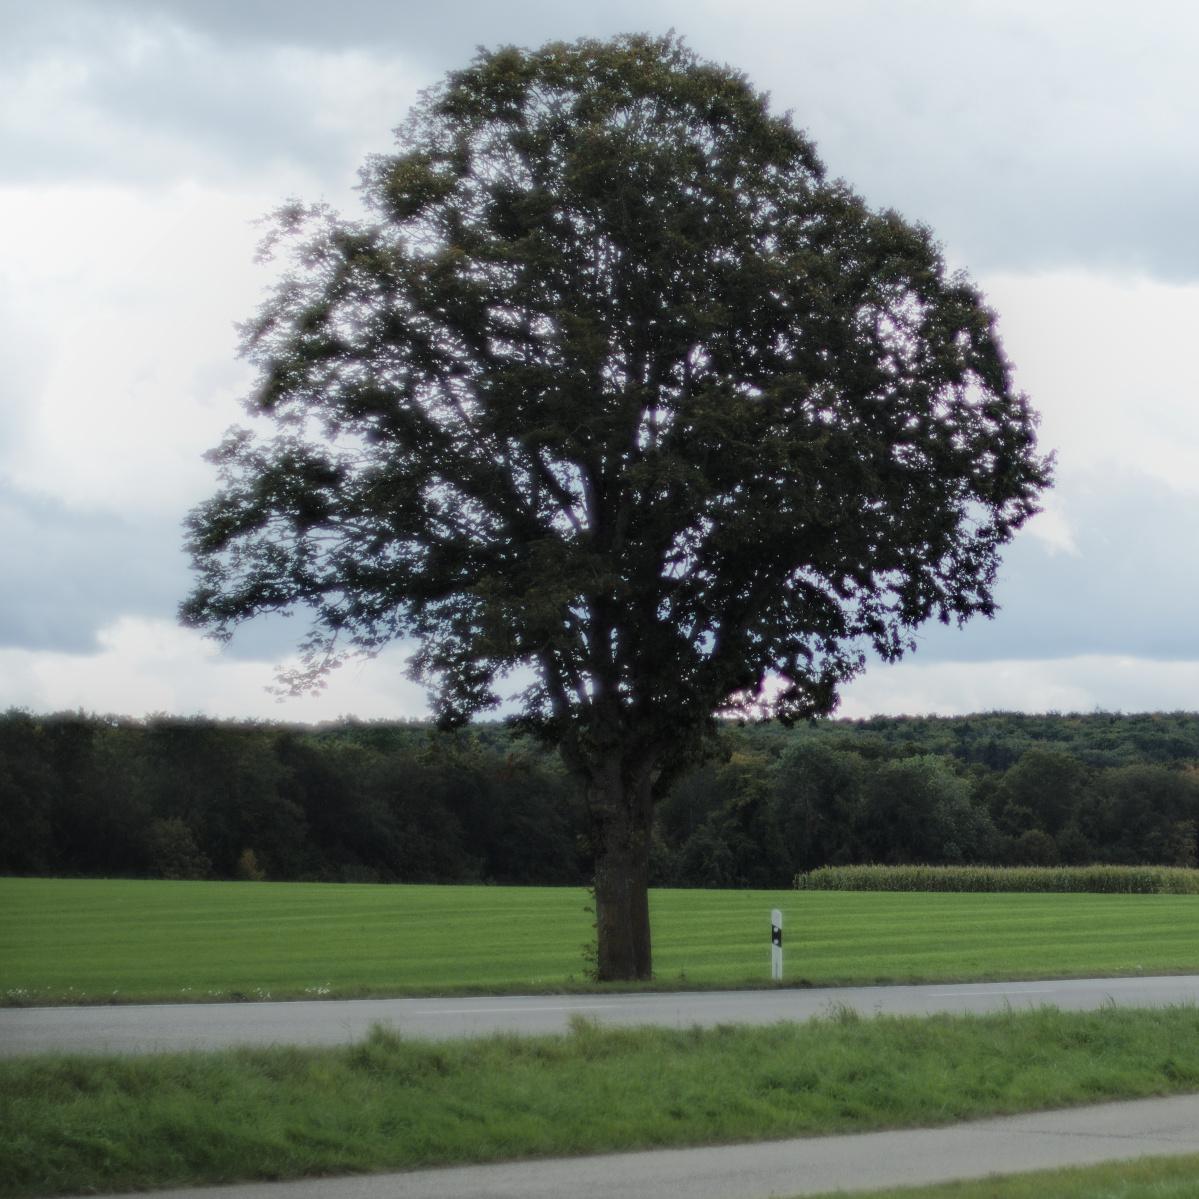 #065 Canon FD SSC f1.2 55mm – Straßenbaum